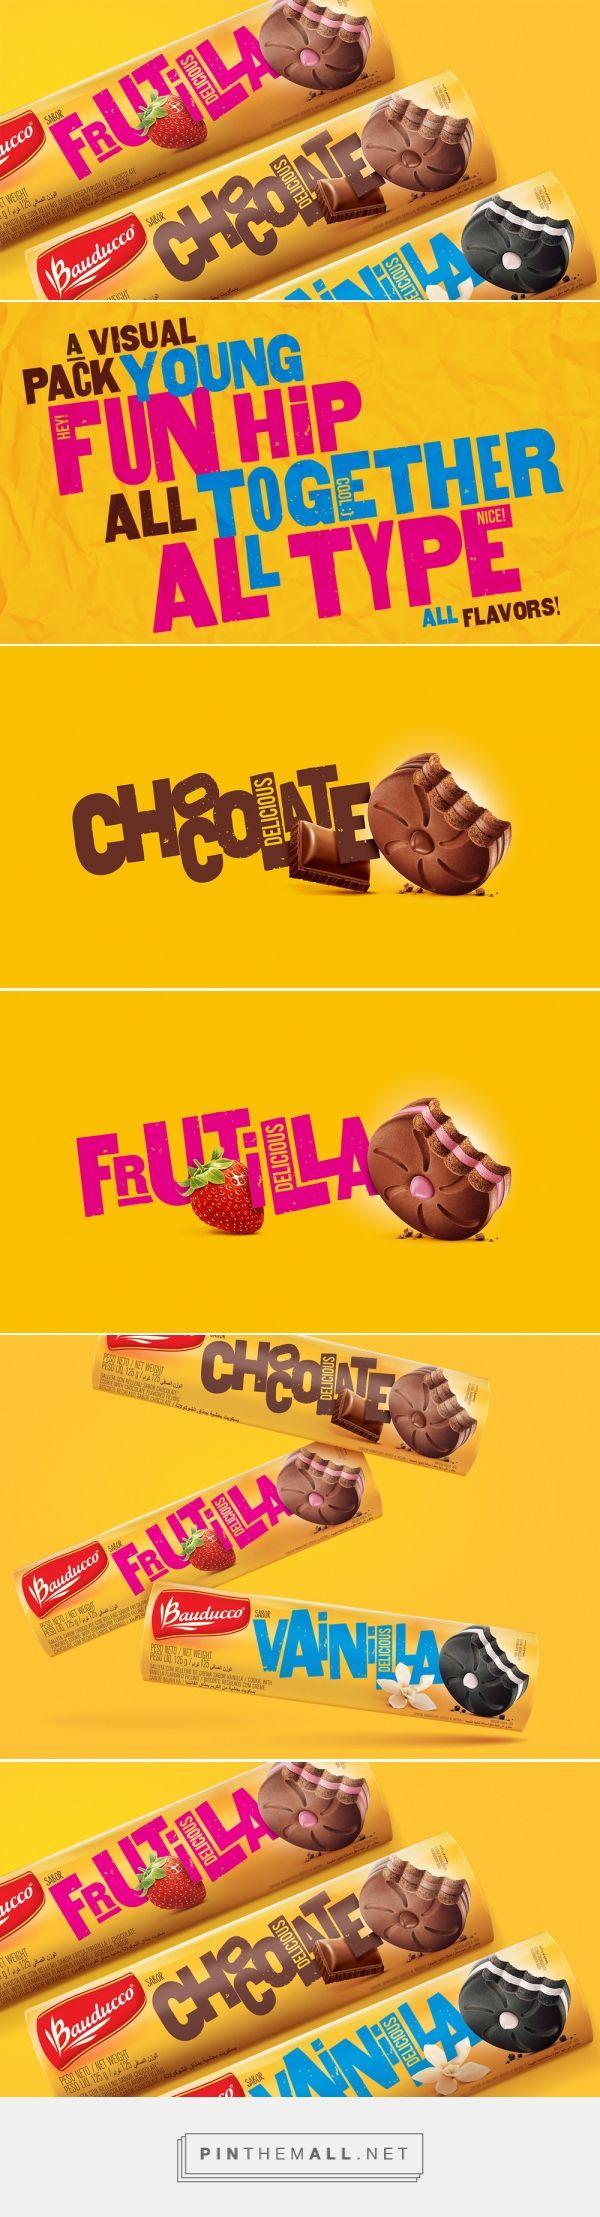 Galletas Bauducco — The Dieline - Branding & Packaging - created via https://pinthemall.net